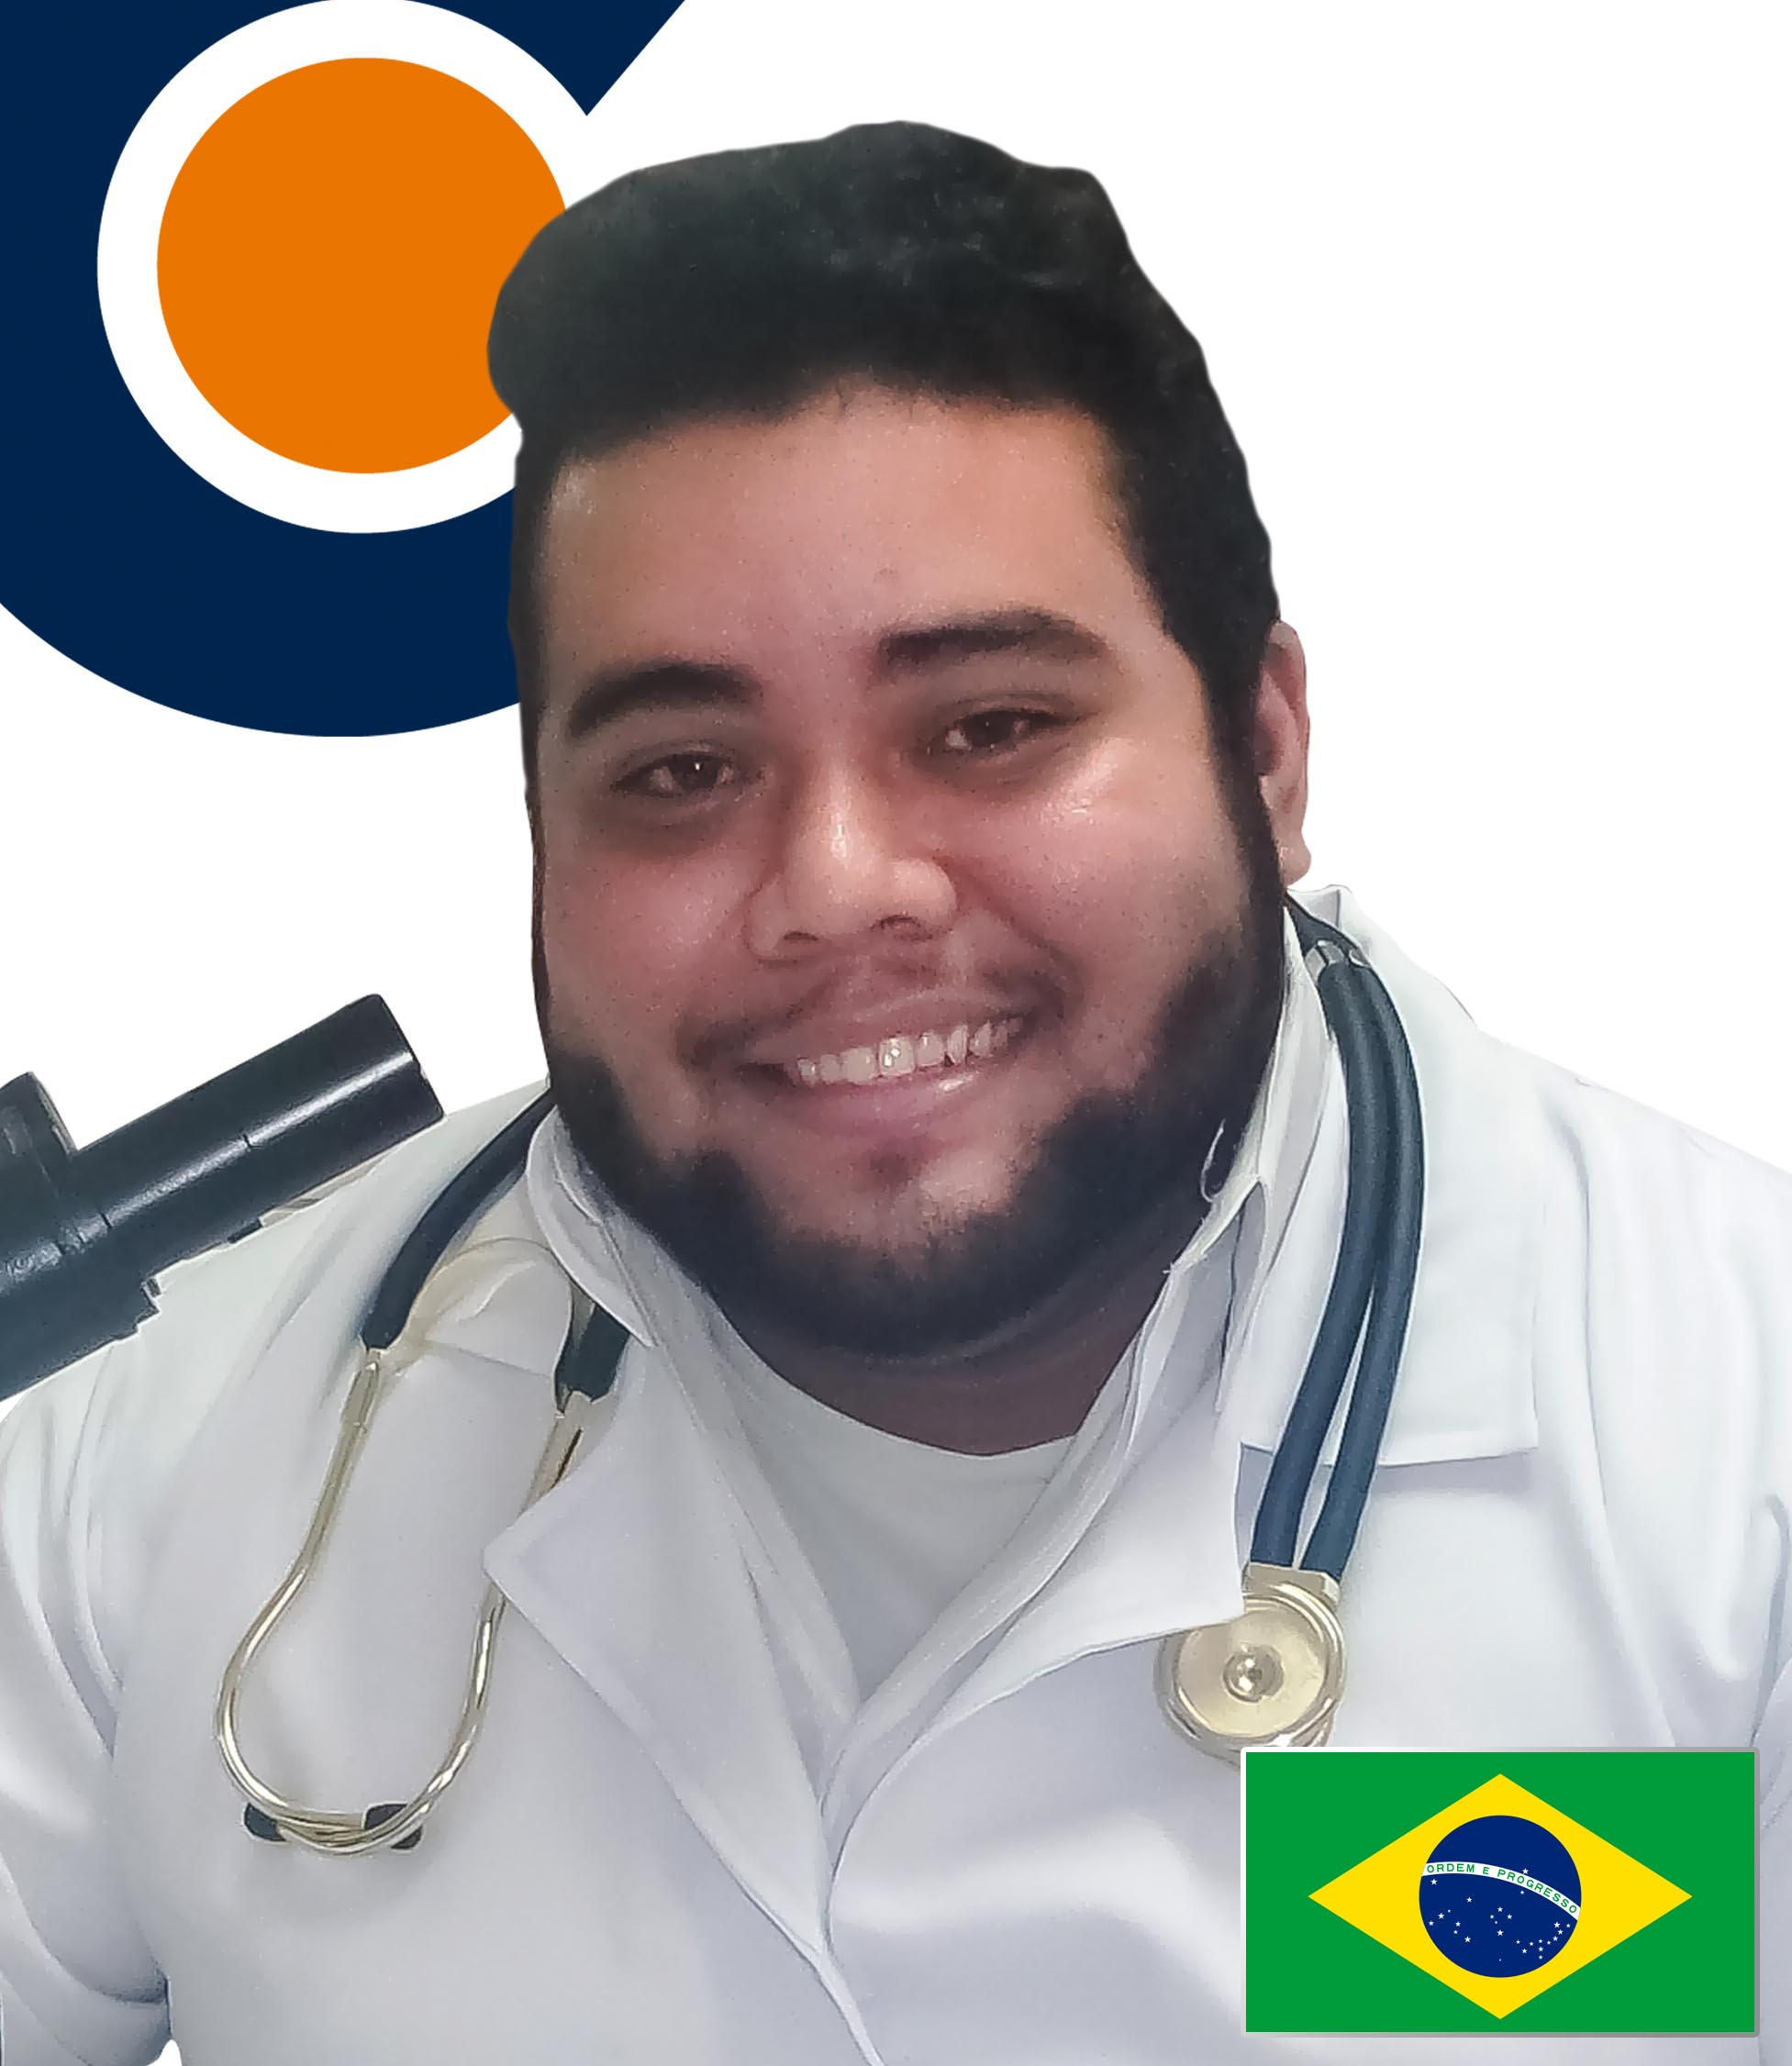 FELIPE KOOLN PEREIRA DE CARVALLO